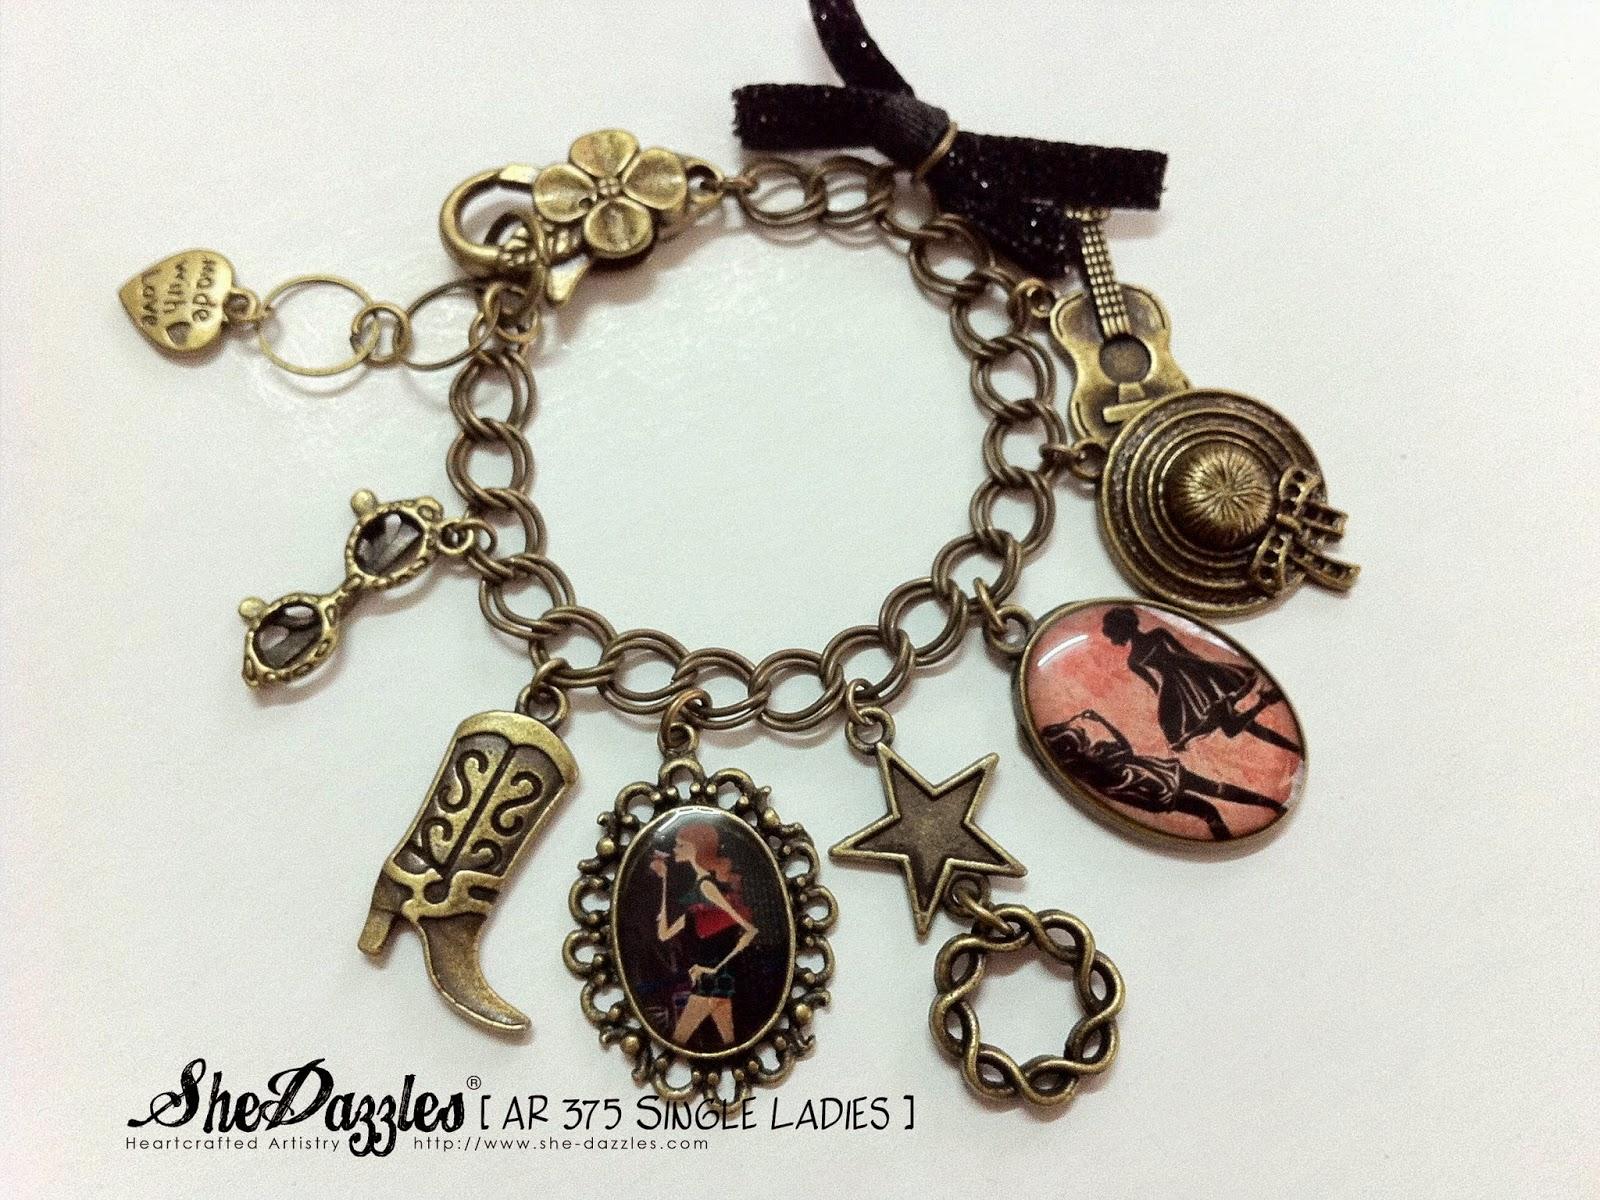 handmade-charm-bracelet-resin-pendant-shedazzles-malaysia